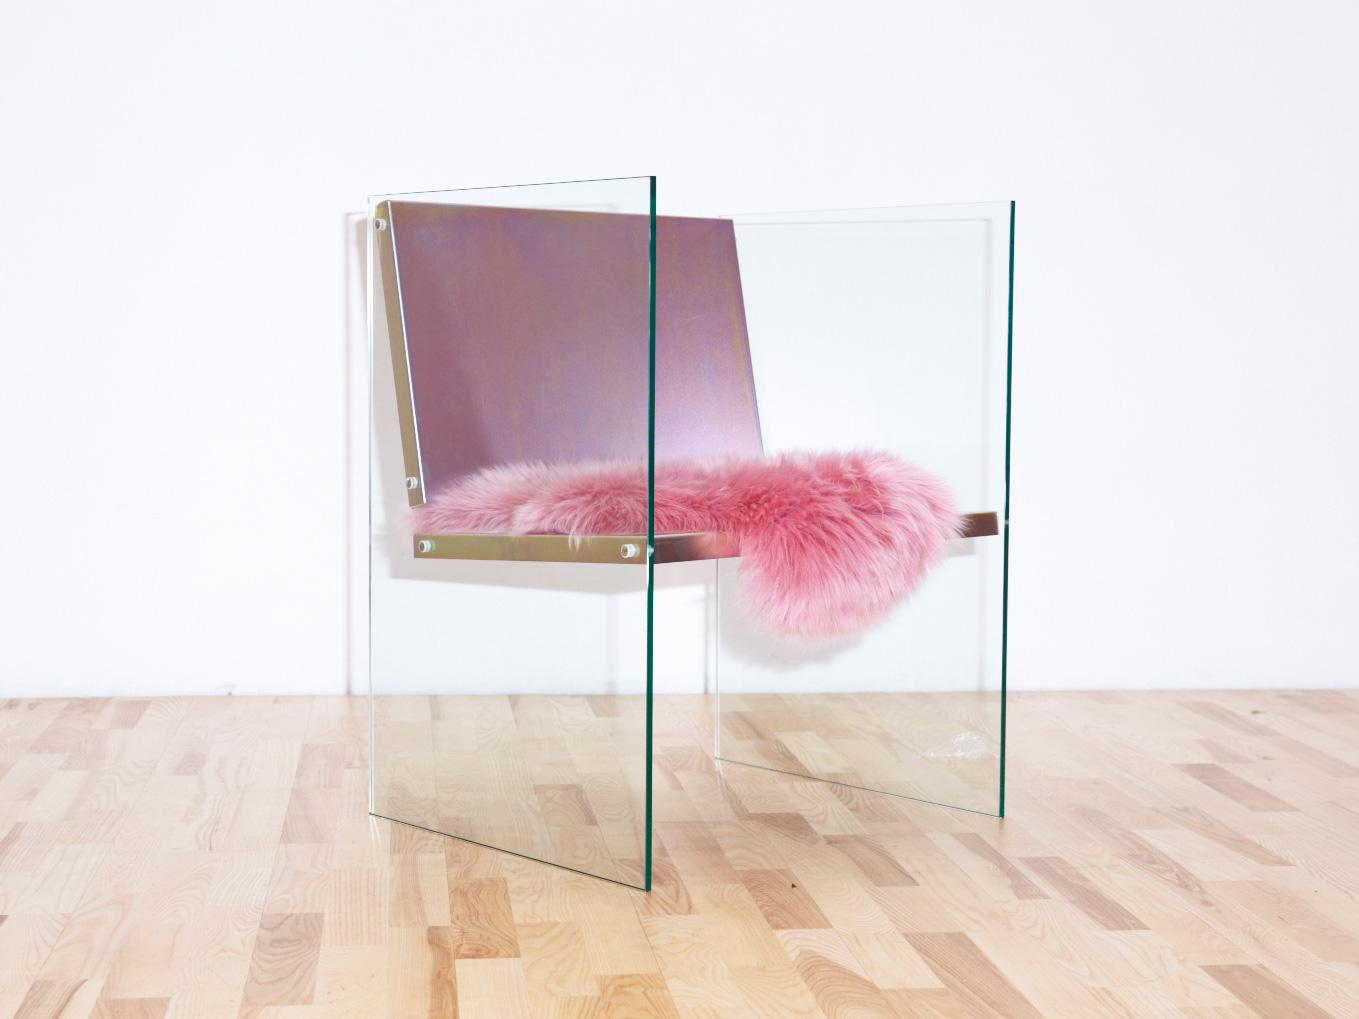 Ornsbergsauktionen 2017, Glass & Steel Chair by Fredrik Paulsen at Stockholm Furniture Fair 2017 | Yellowtrace